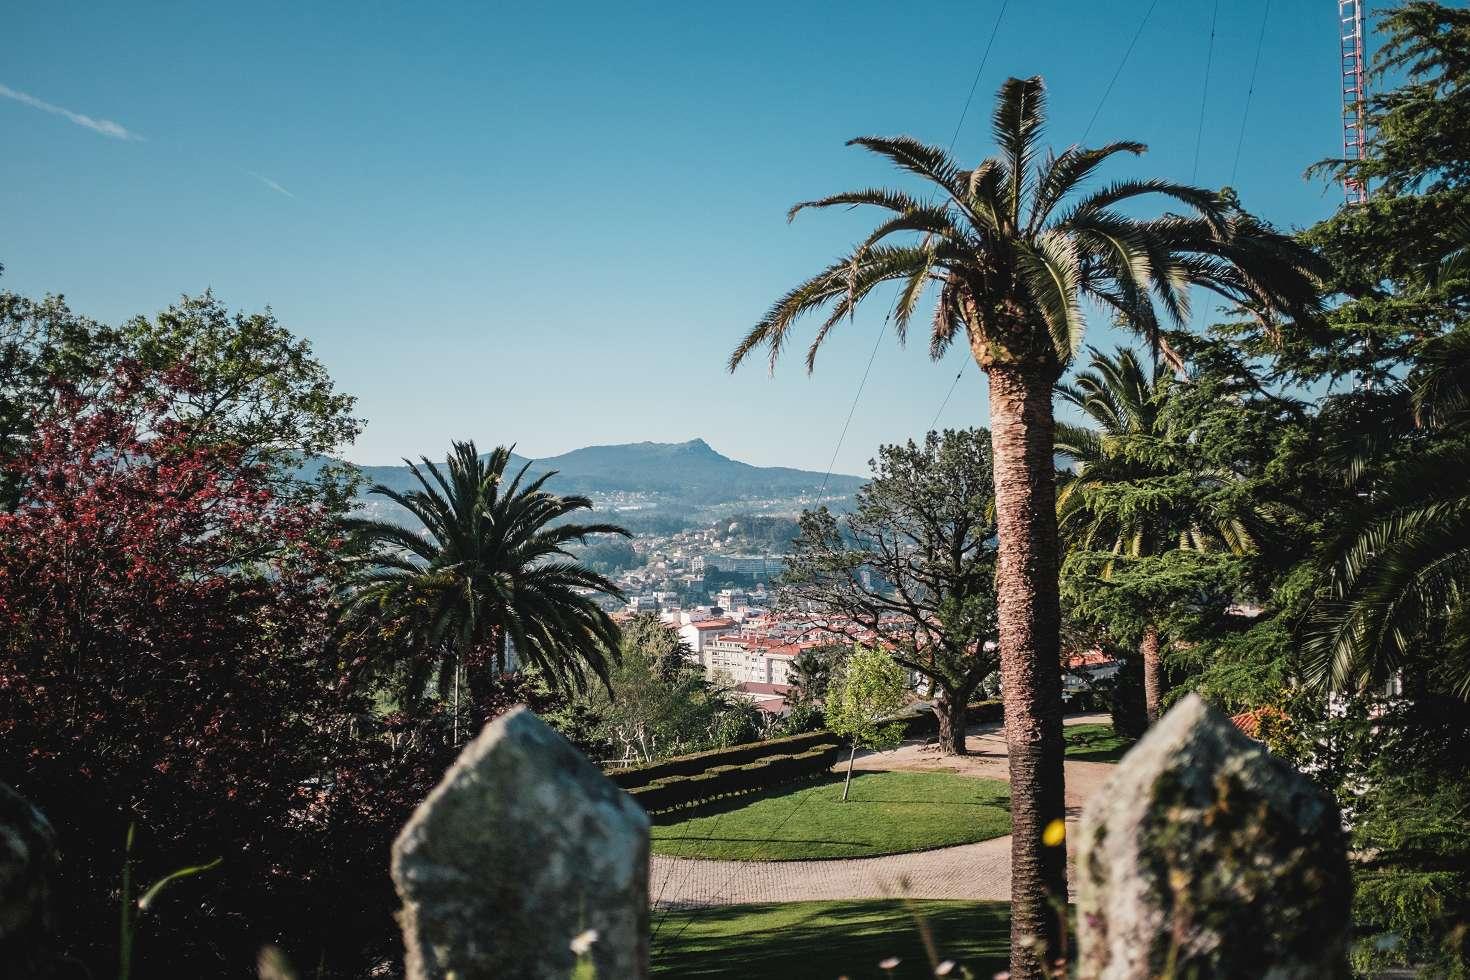 Valencia-Lissabon-Vigo-Stonehenge (59)